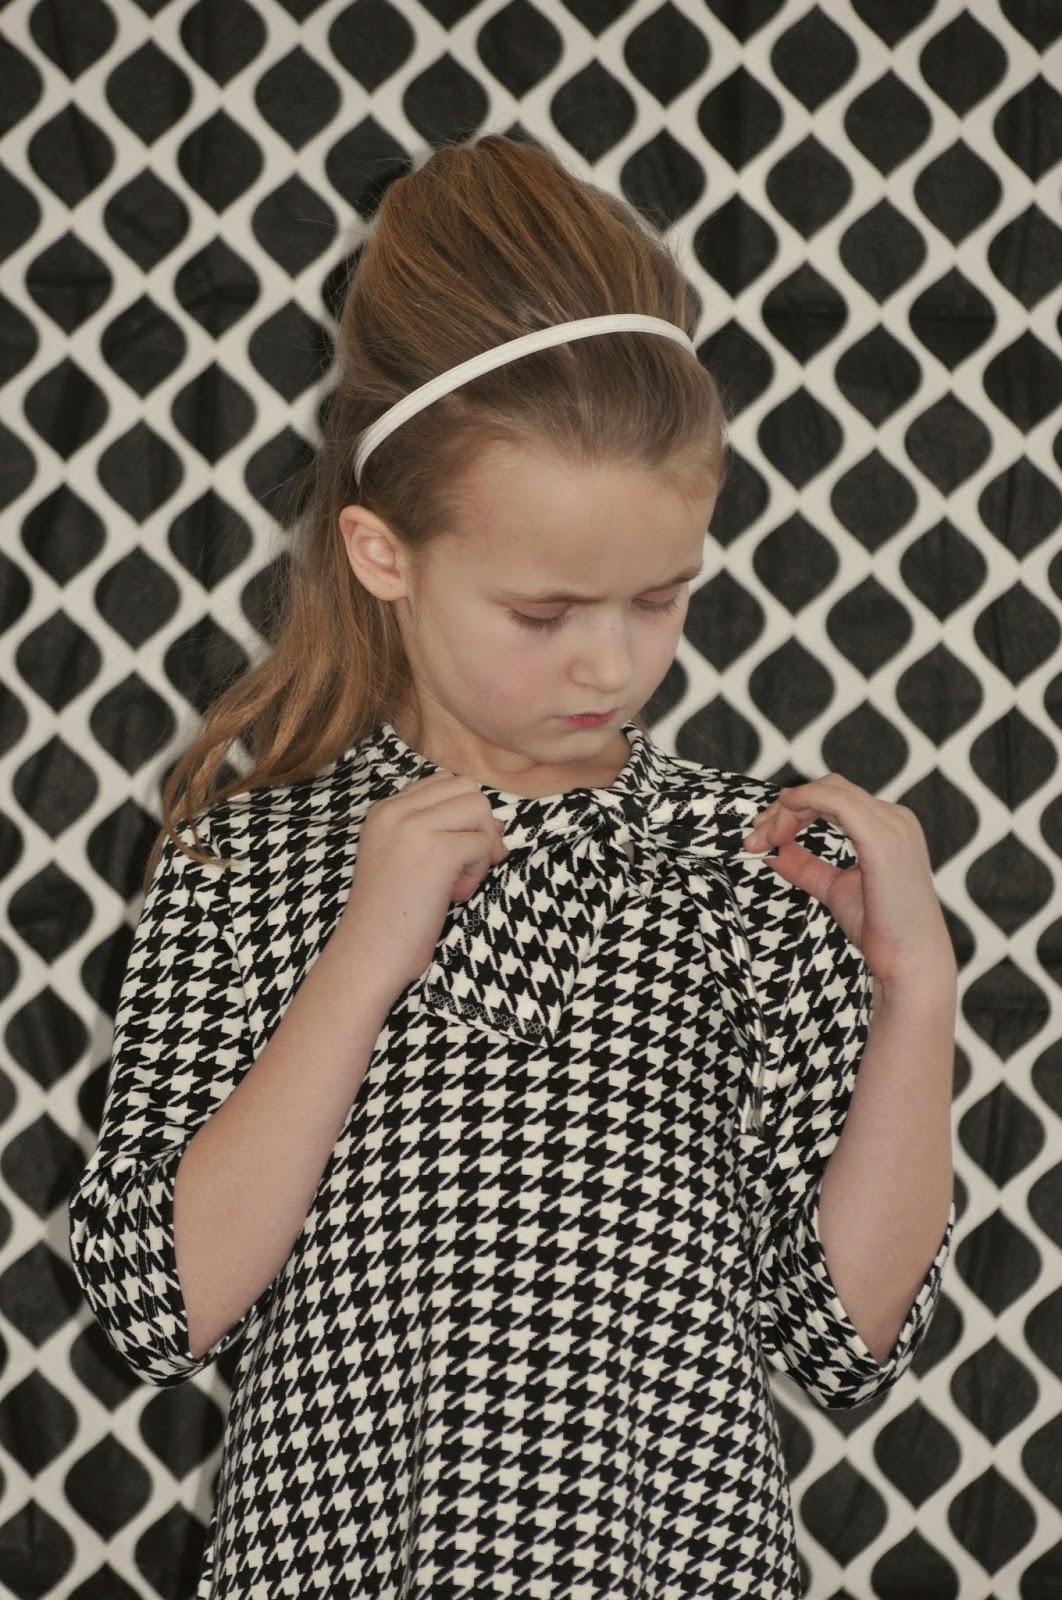 houndstooth DIY kinderjurk workshop naaien sewing fabric pied de poule